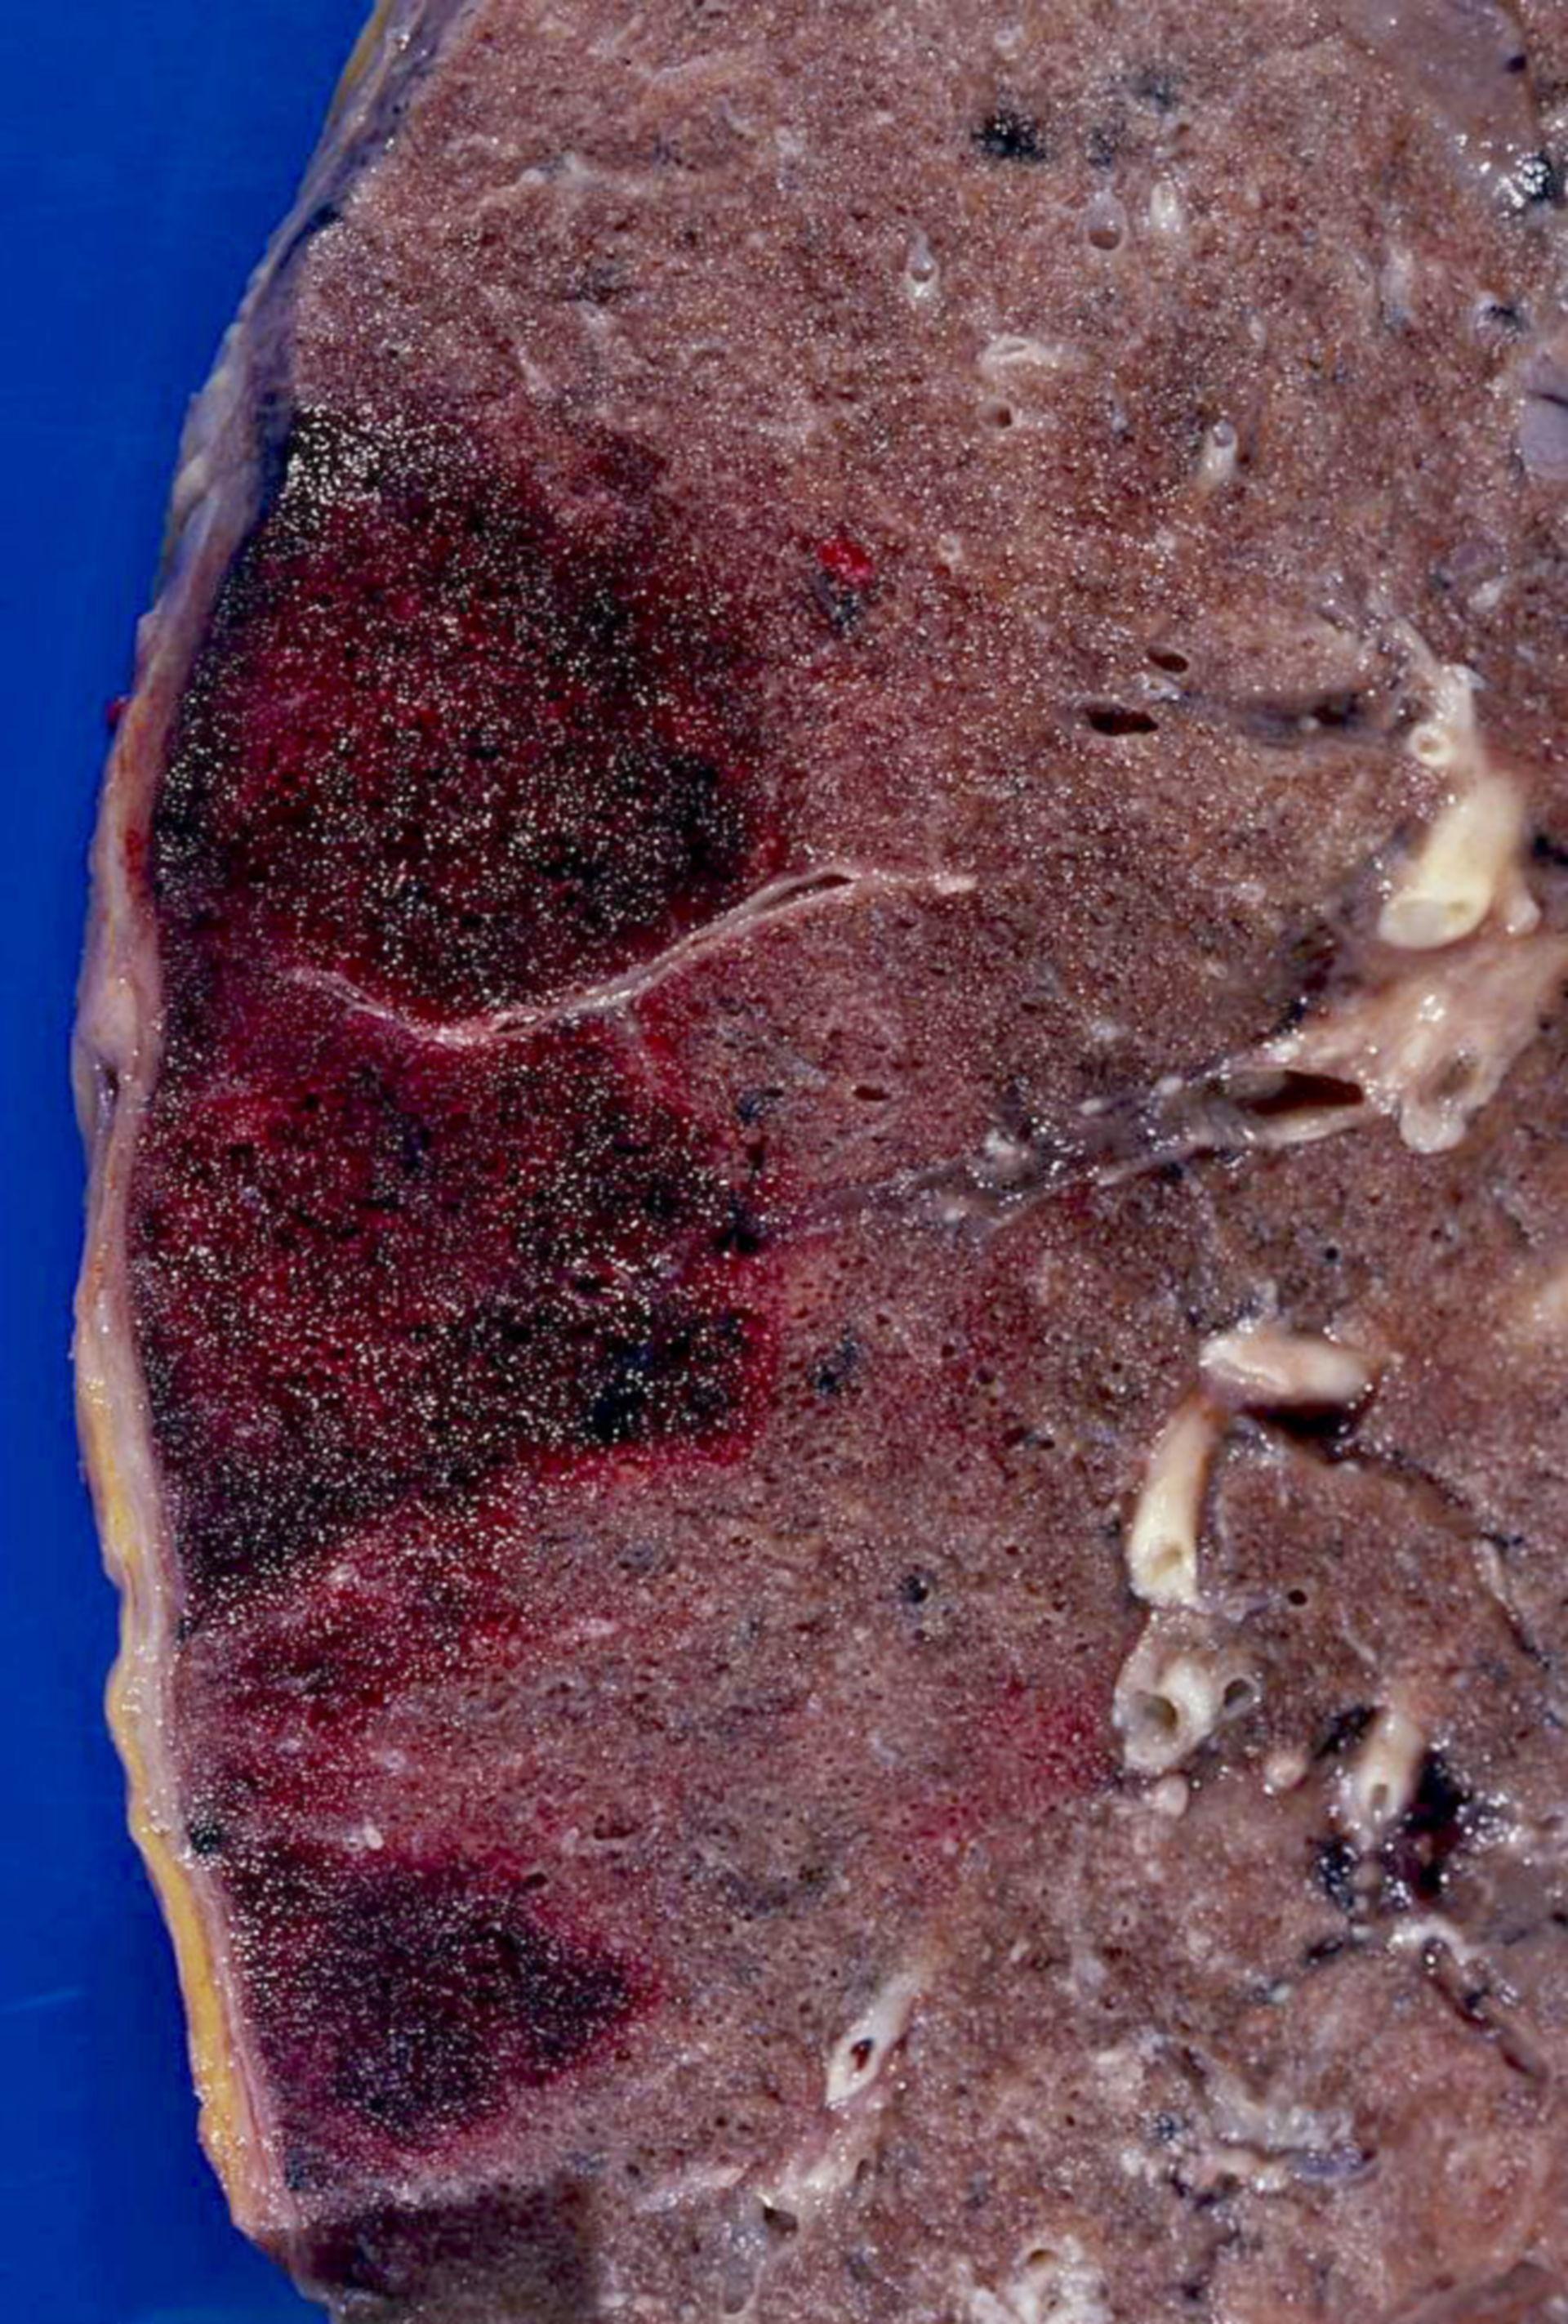 Fresh hemorrhagic lung infarctions